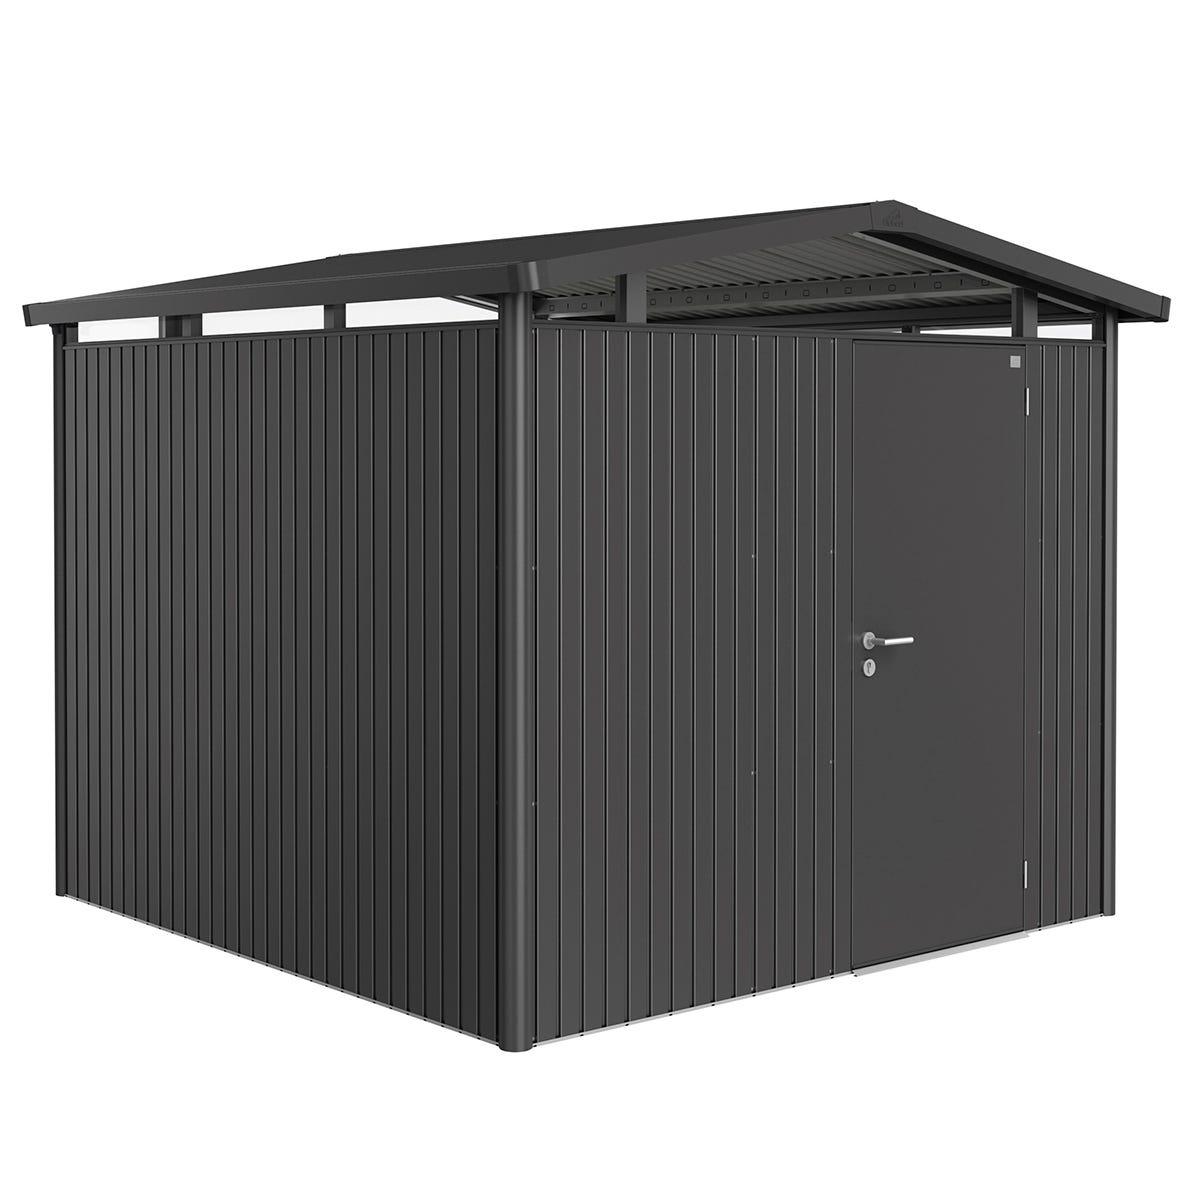 Biohort Panorama Metal Shed P4 Standard Door 9' x 9' 1'' - Dark Grey